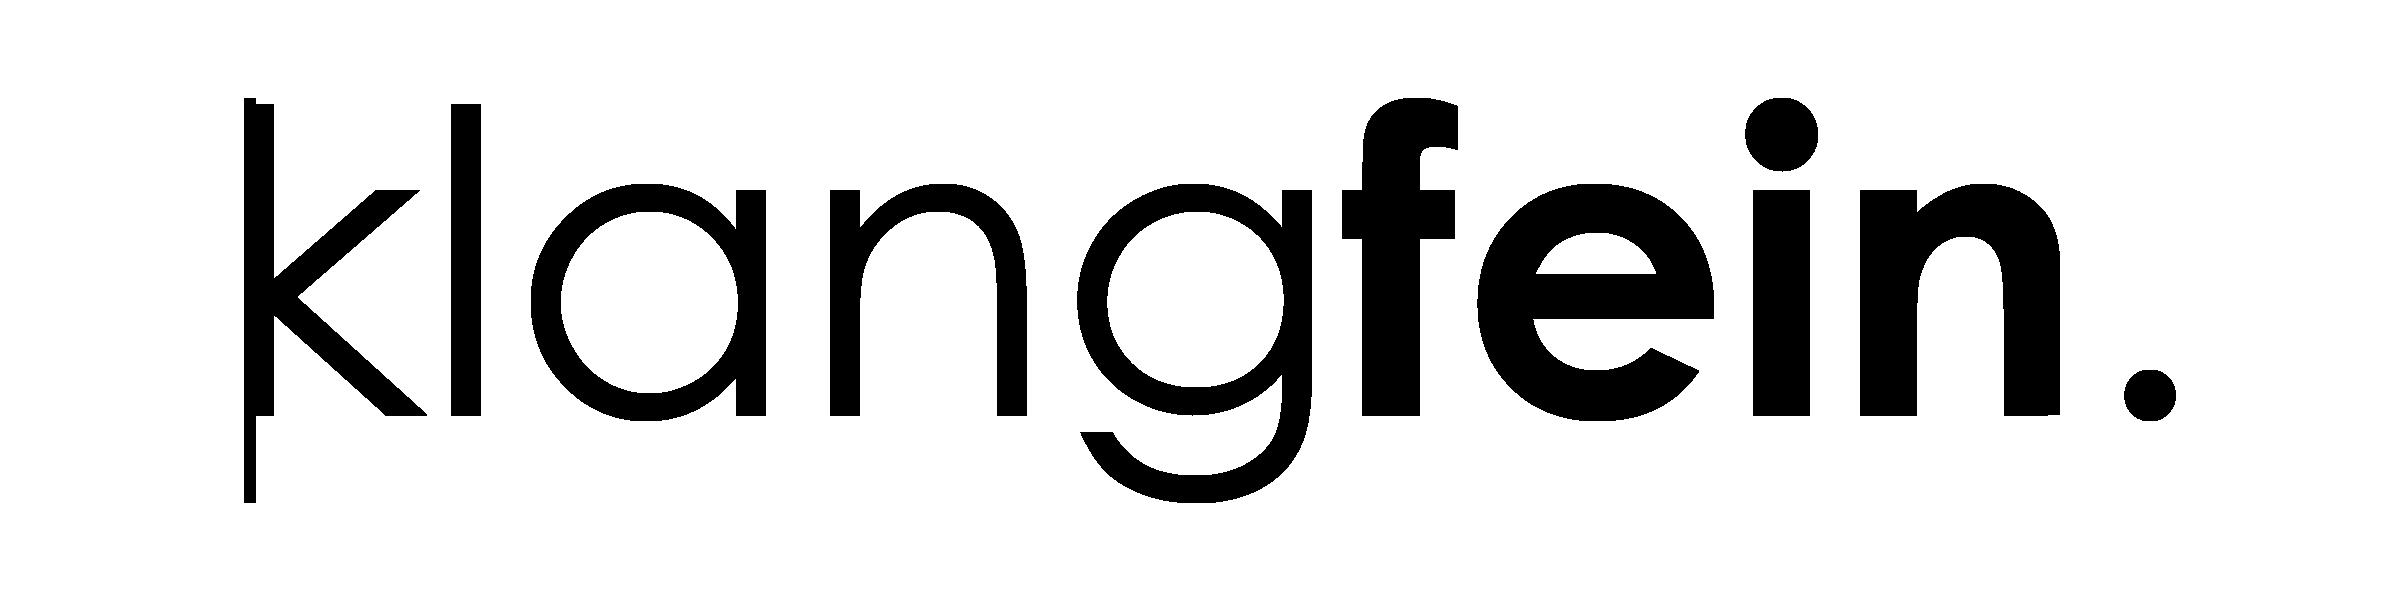 klangfein | Ton | Licht | Beschallung | Beamer | Leinwand | Videowall | Hannover | Veranstaltungstechnik | Mikrofone Kopie | S | W